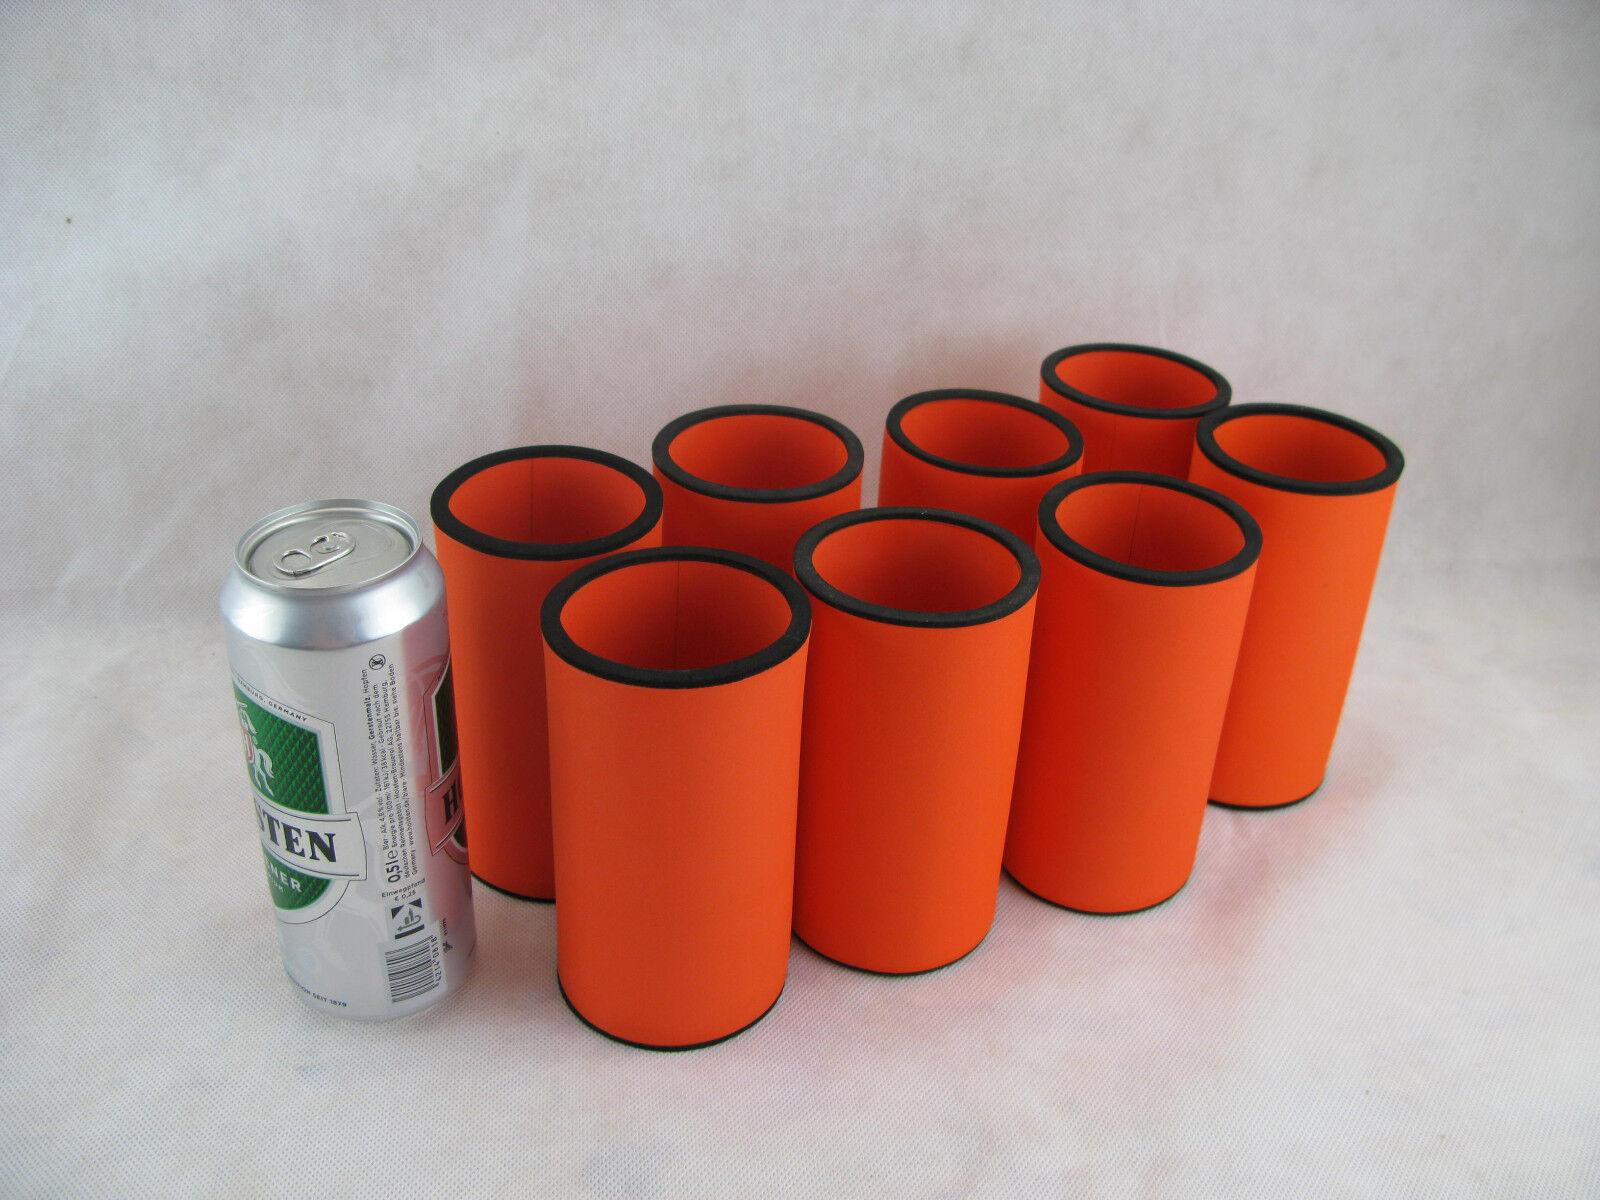 8x 0,5L Dosenkühler  Bierkühler Getränkekühler Kühler Neoprenkühler Top Qualität  brand